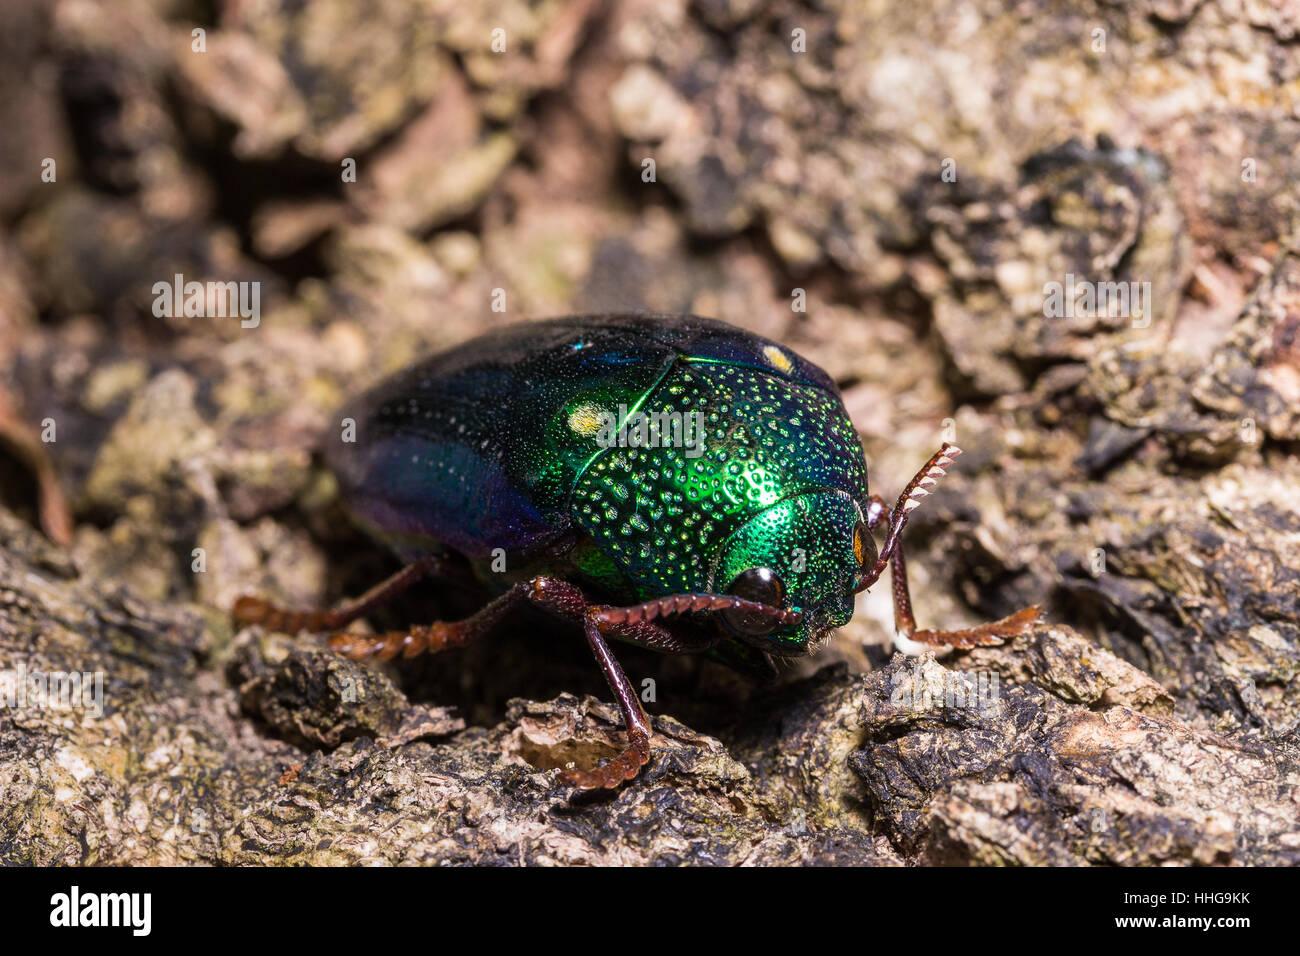 Jewel Beetle (Sternocera ruficornis) on the green leaf - Stock Image